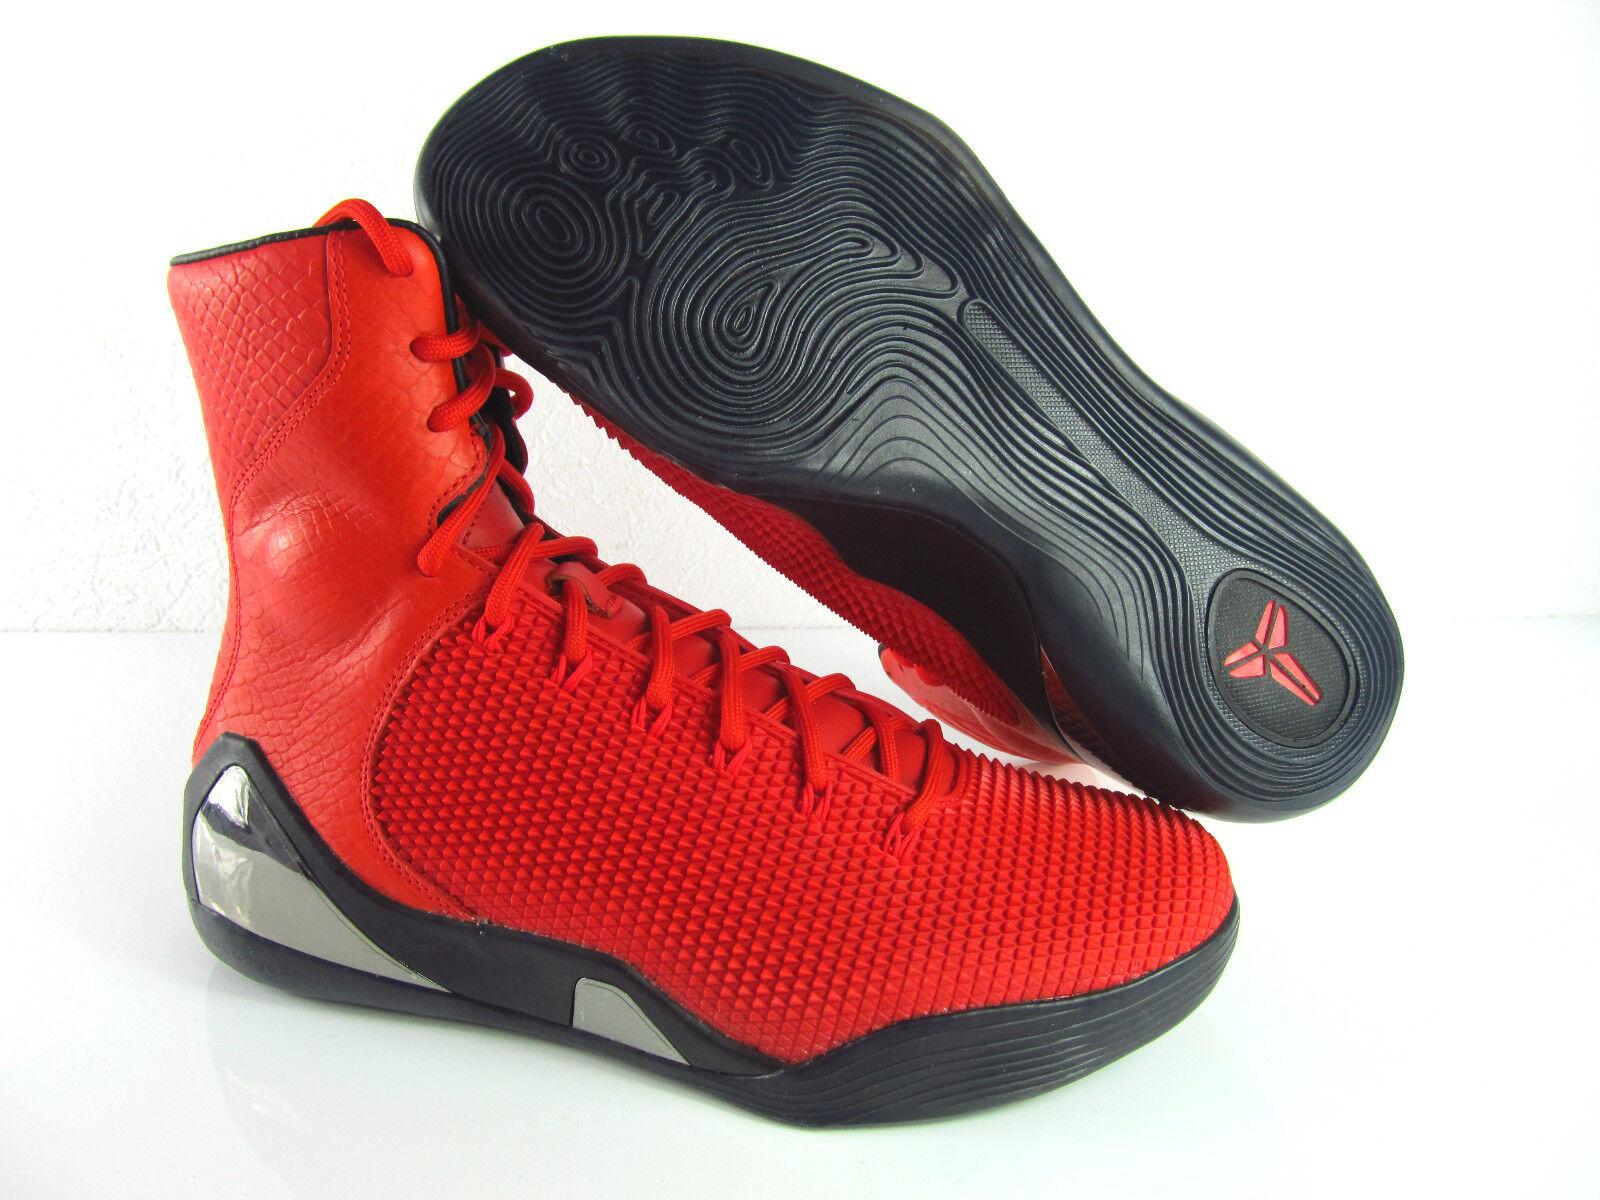 Nike Kobe IX High KRM EXT QS Challenge Red Exclusive UK_8.5 US_7 9.5 Eur_40 43